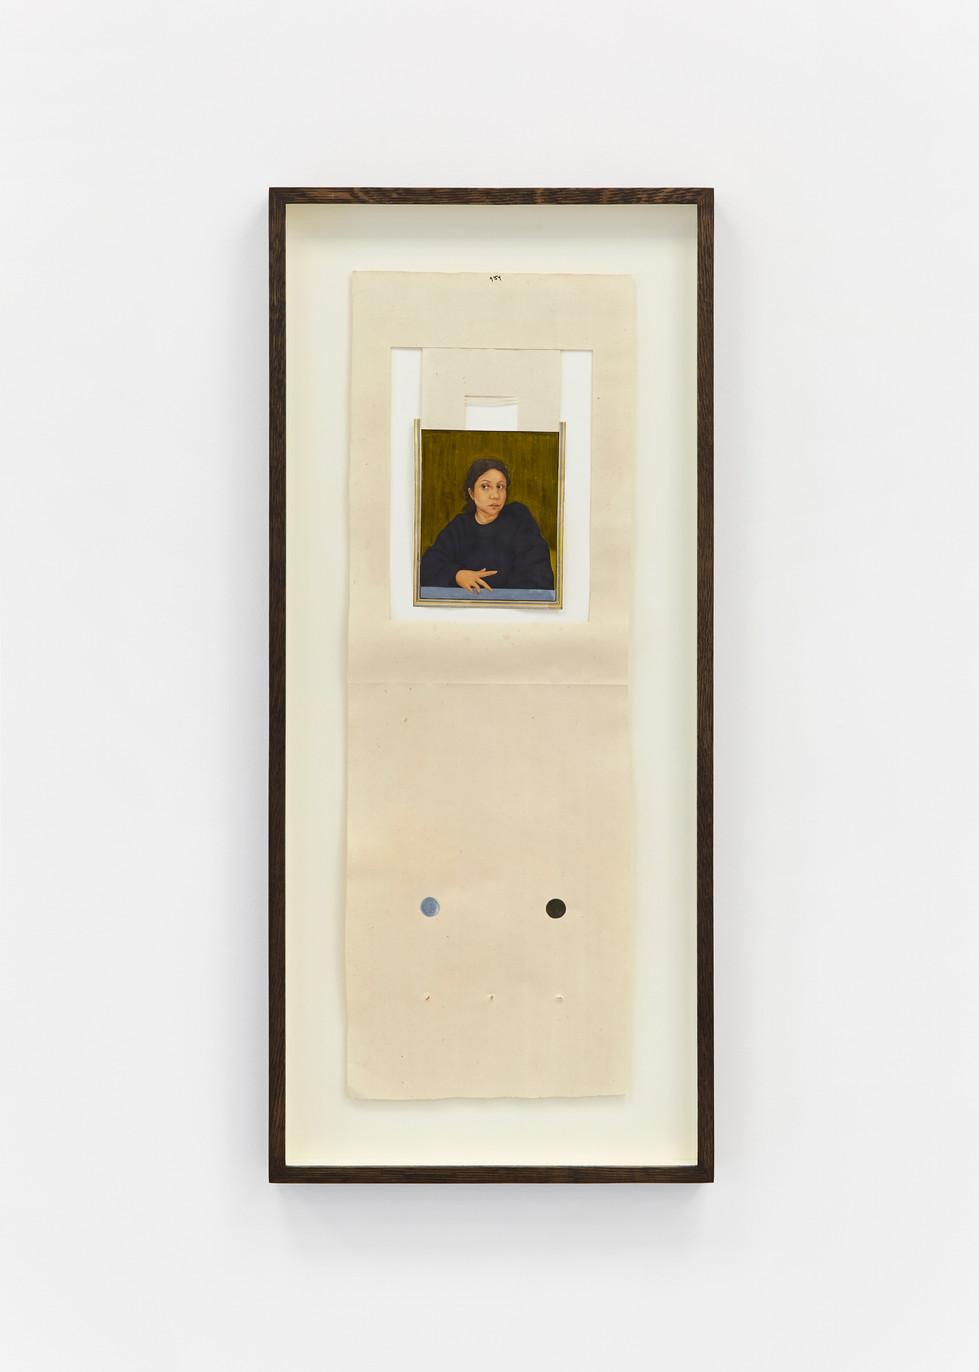 Self Portrait in Miniature